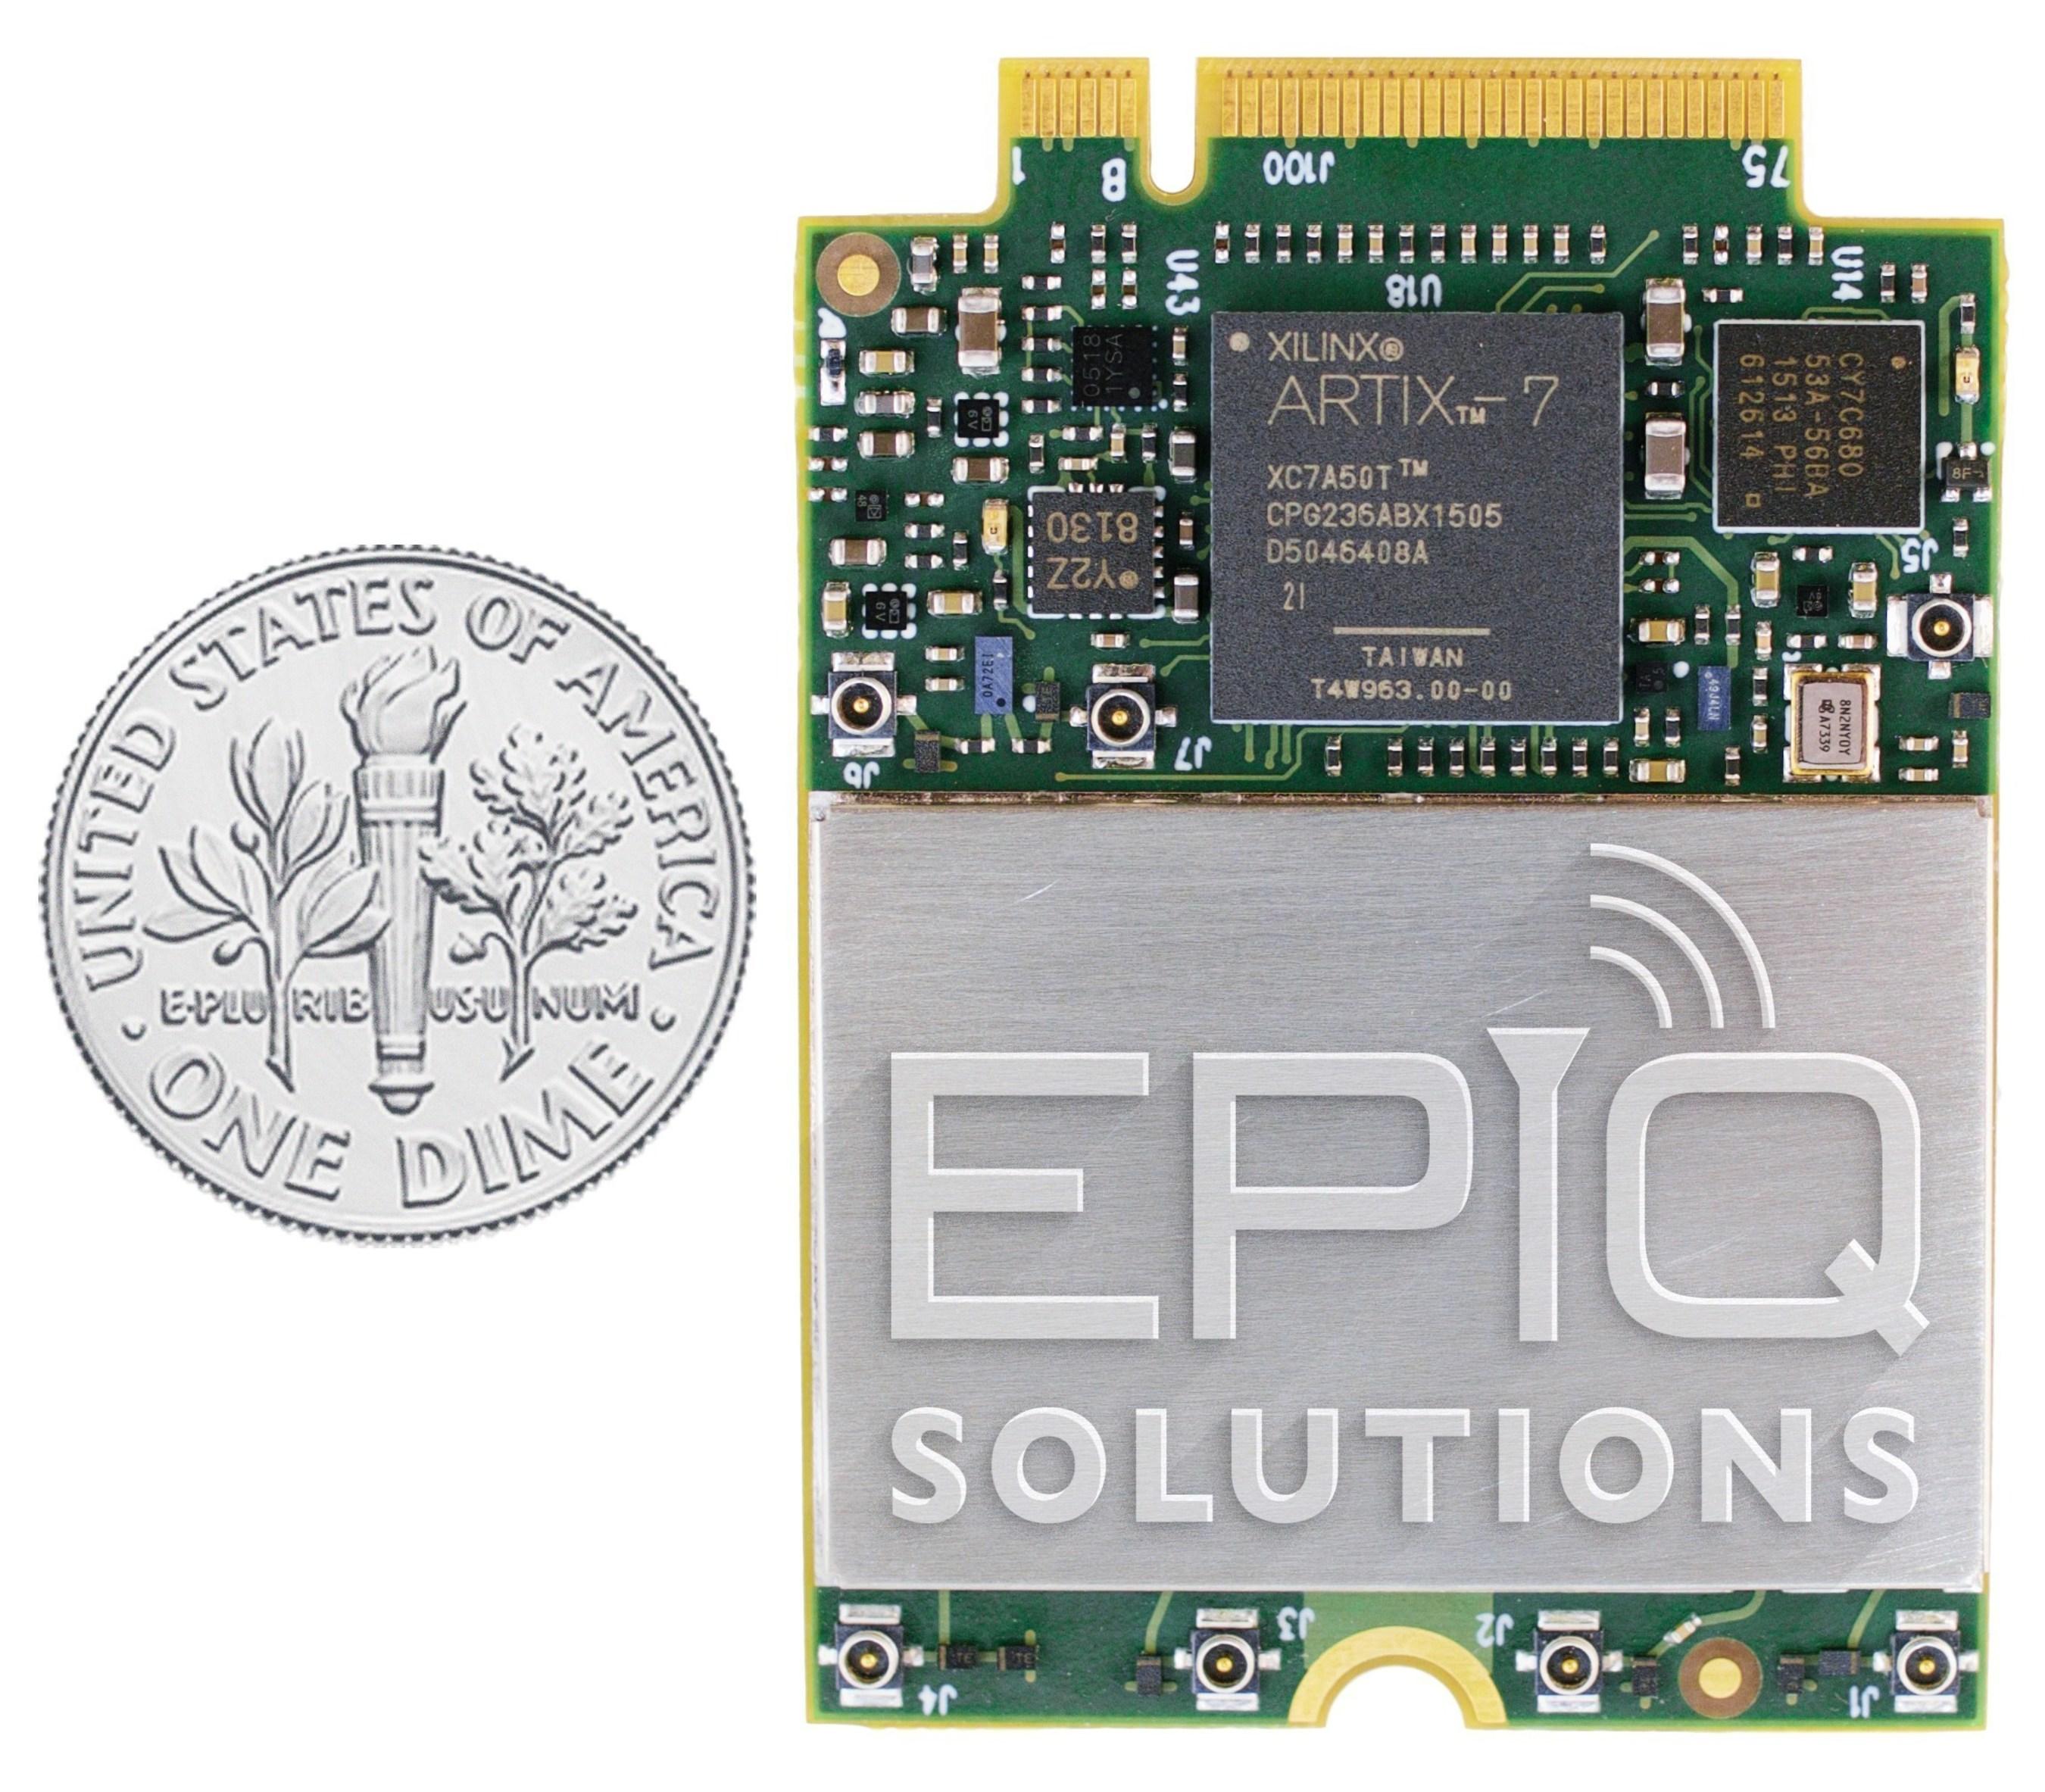 Epiq Solutions Sidekiq M.2 Software Defined Radio (SDR) card